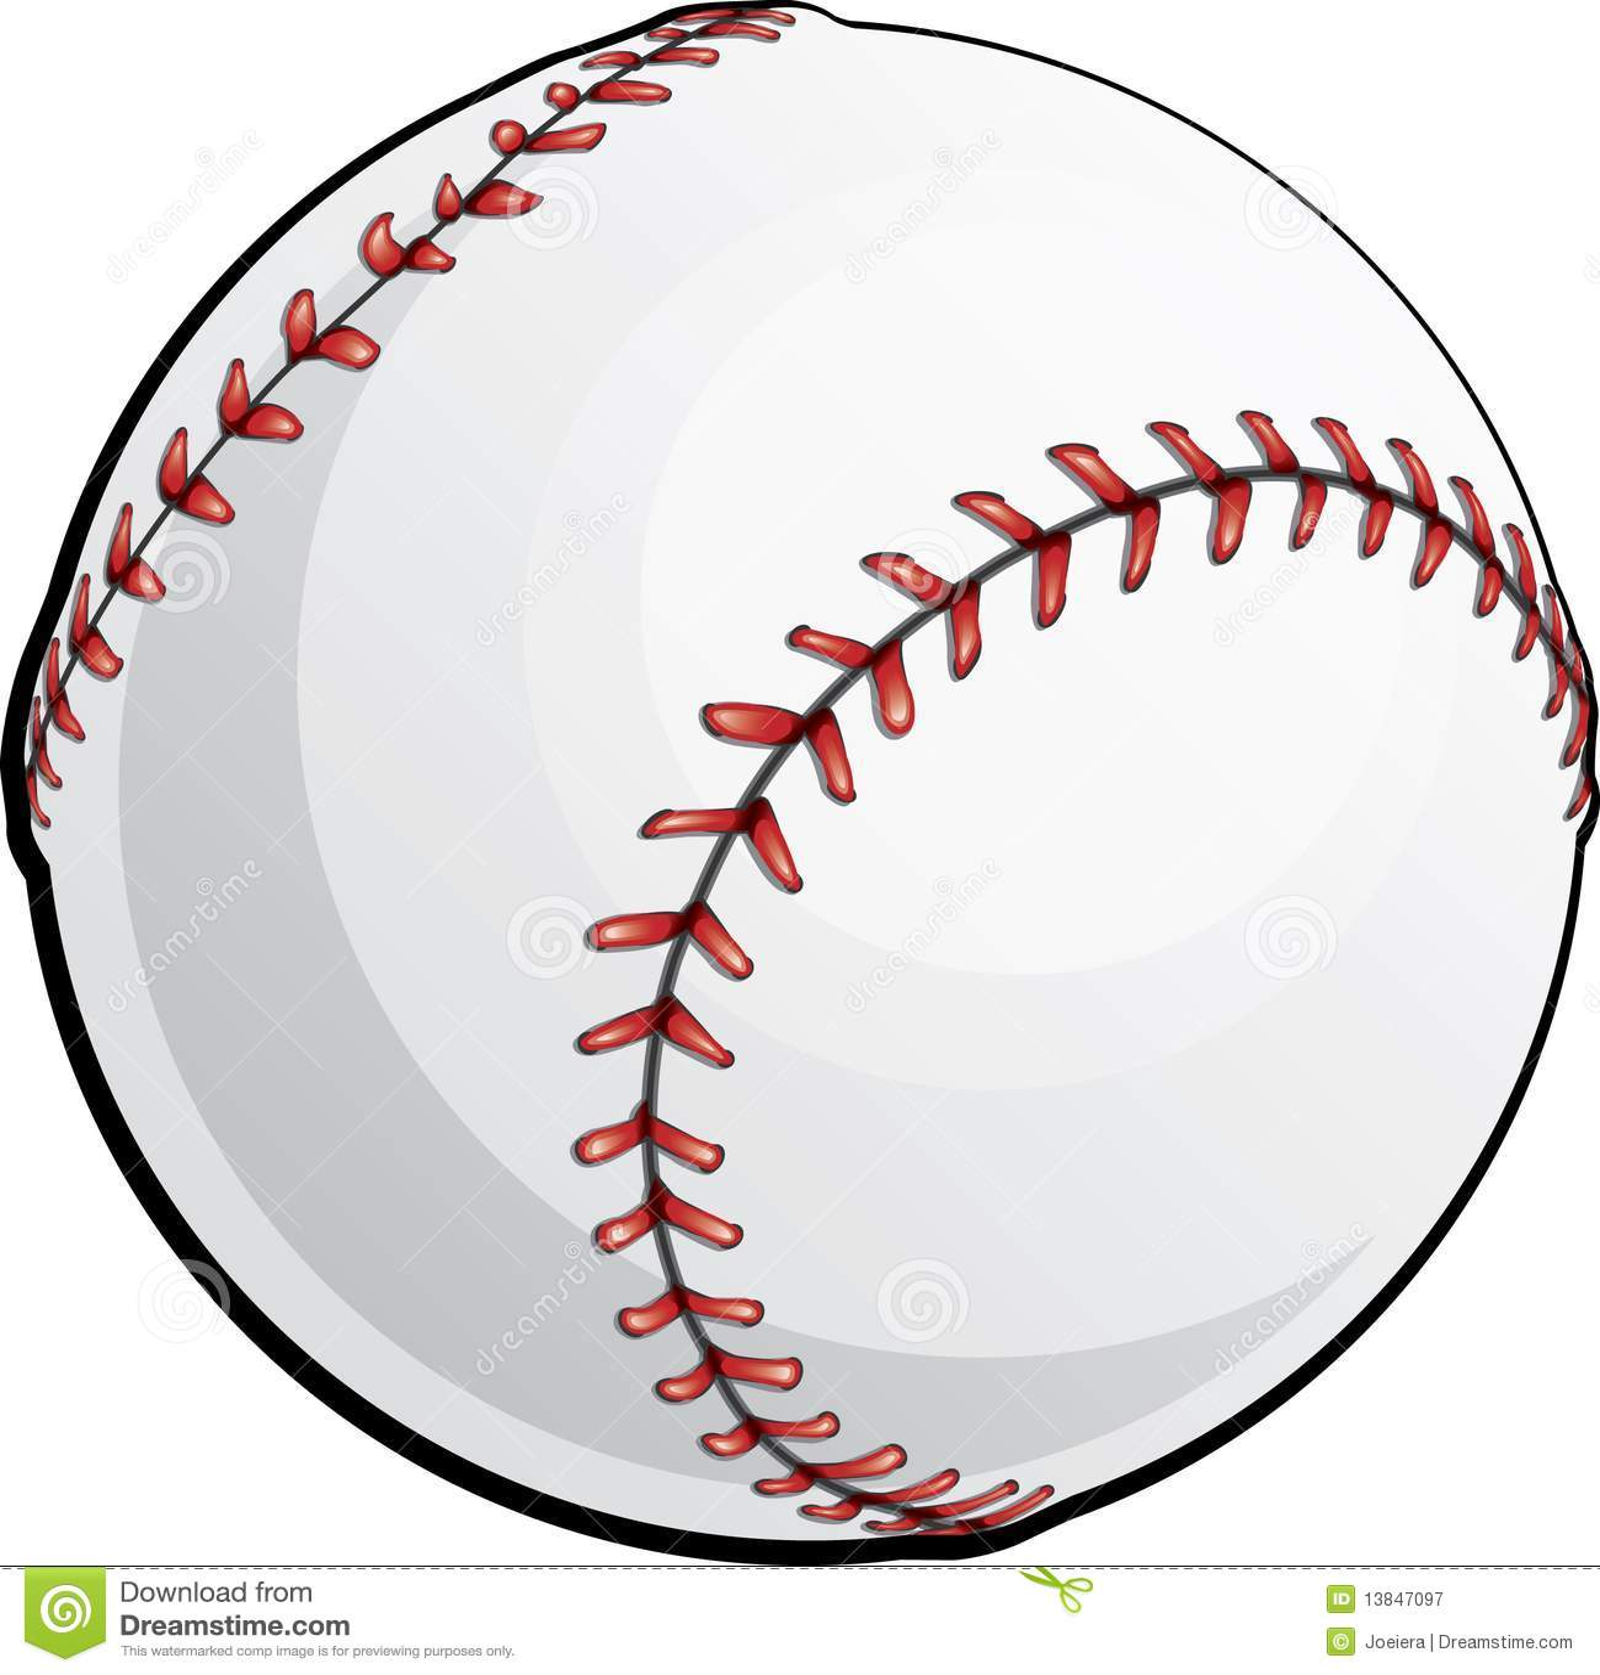 Baseball stock vector. Illustration of isolated, ball ...